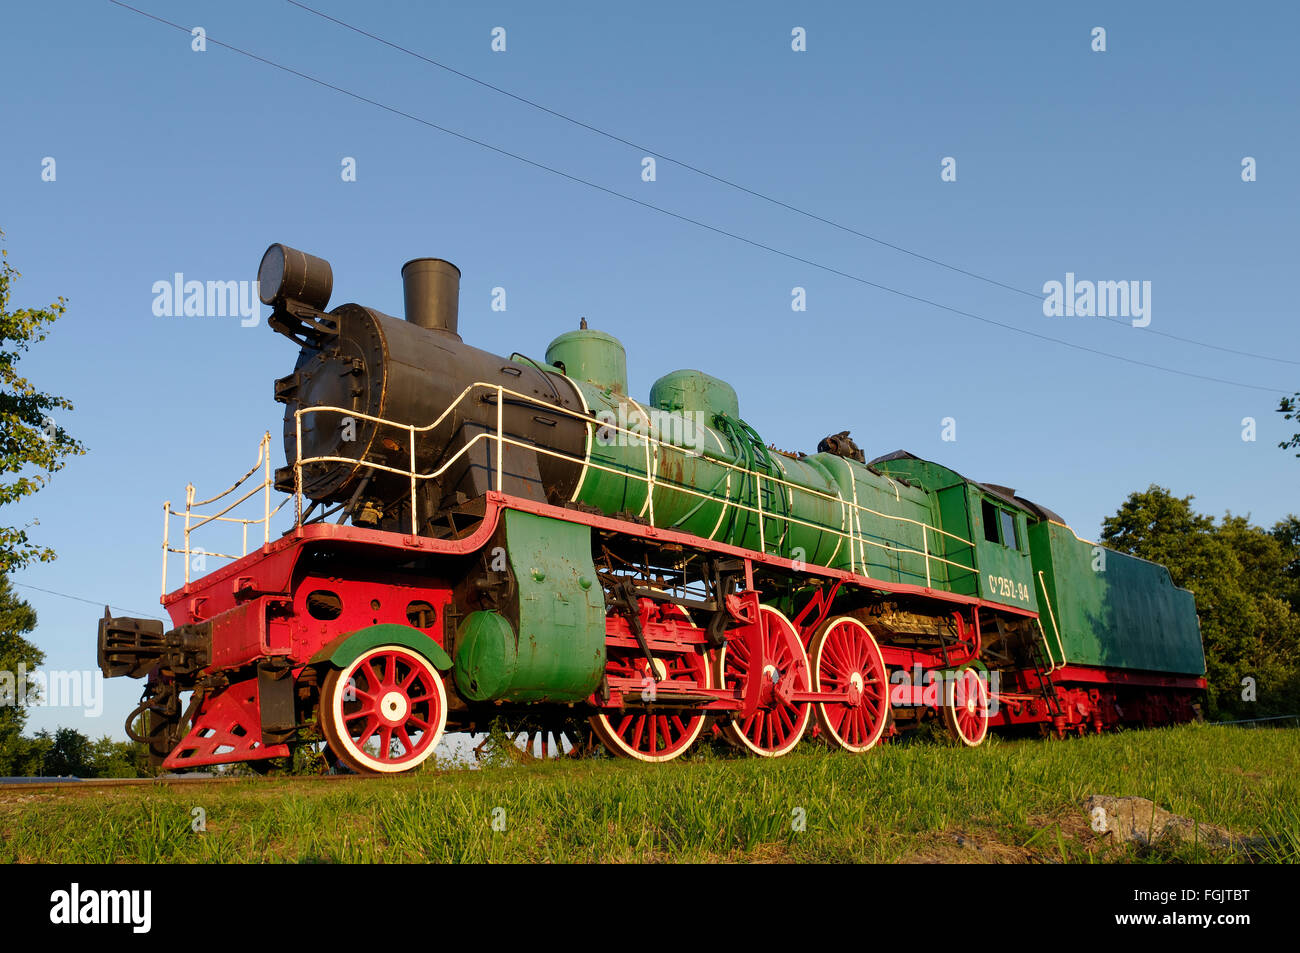 The Railway and Communications Museum exhibit in Haapsalu, the old steam locomotive. Haapsalu, Estonia - Stock Image